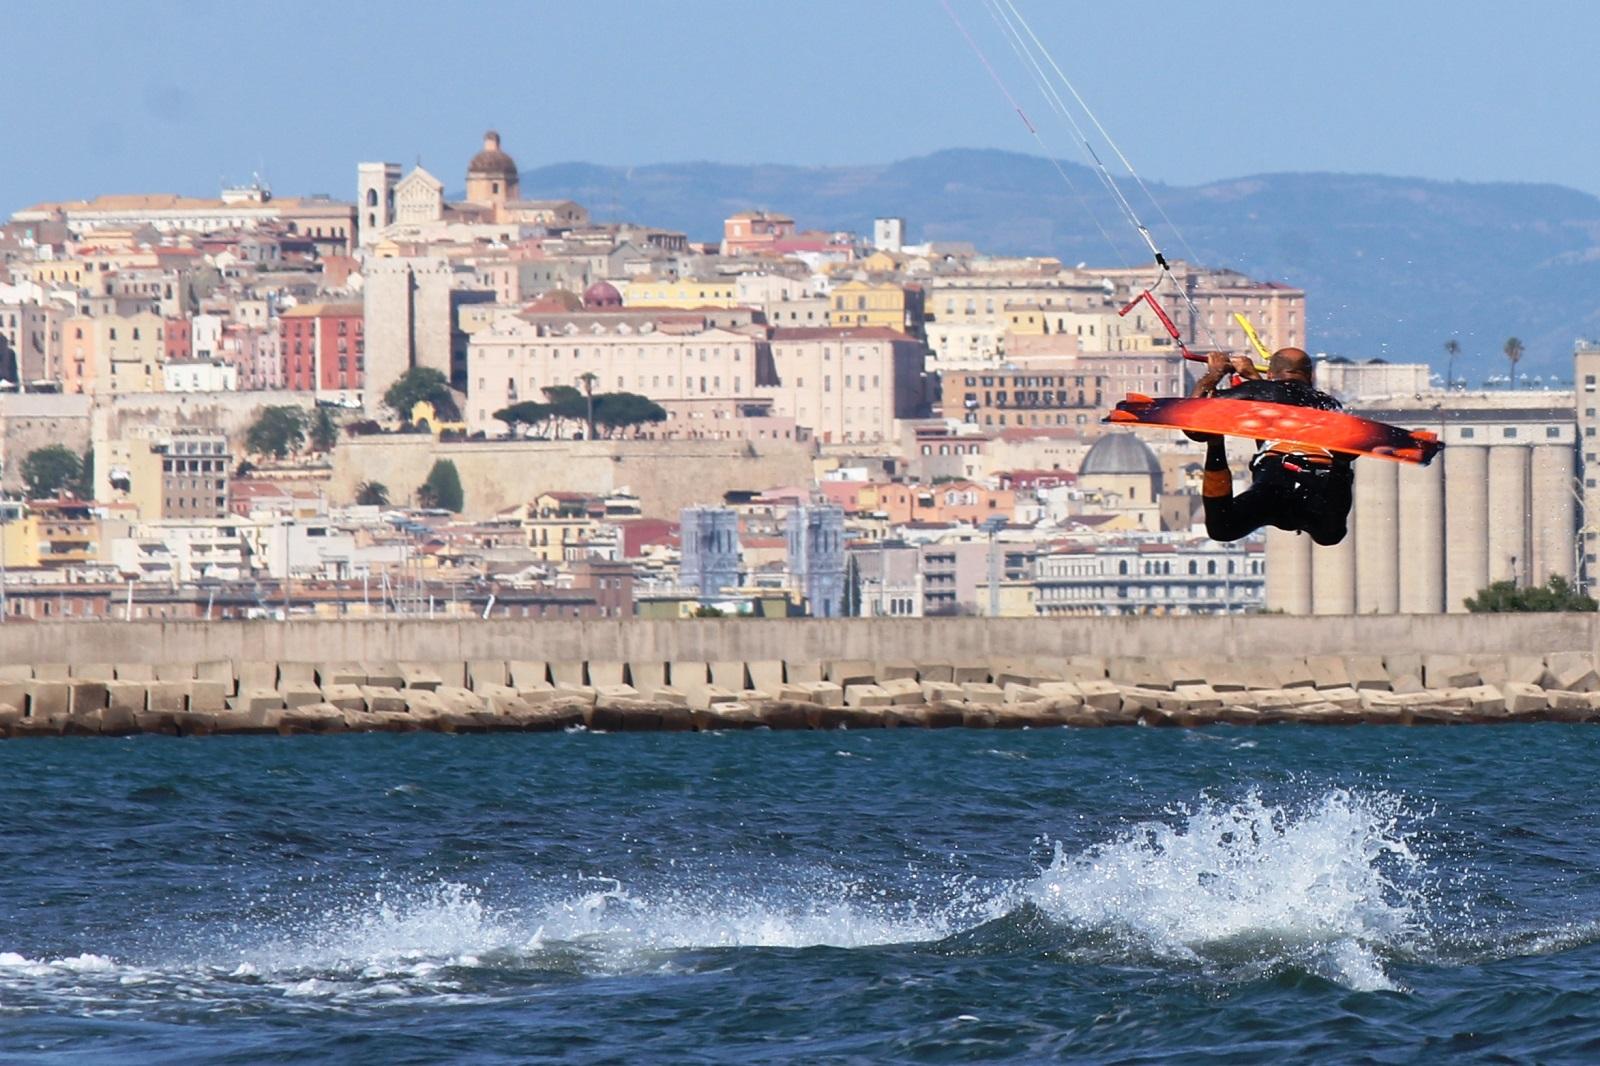 Kitesurfing at Giorgino Kite Beach Cagliari